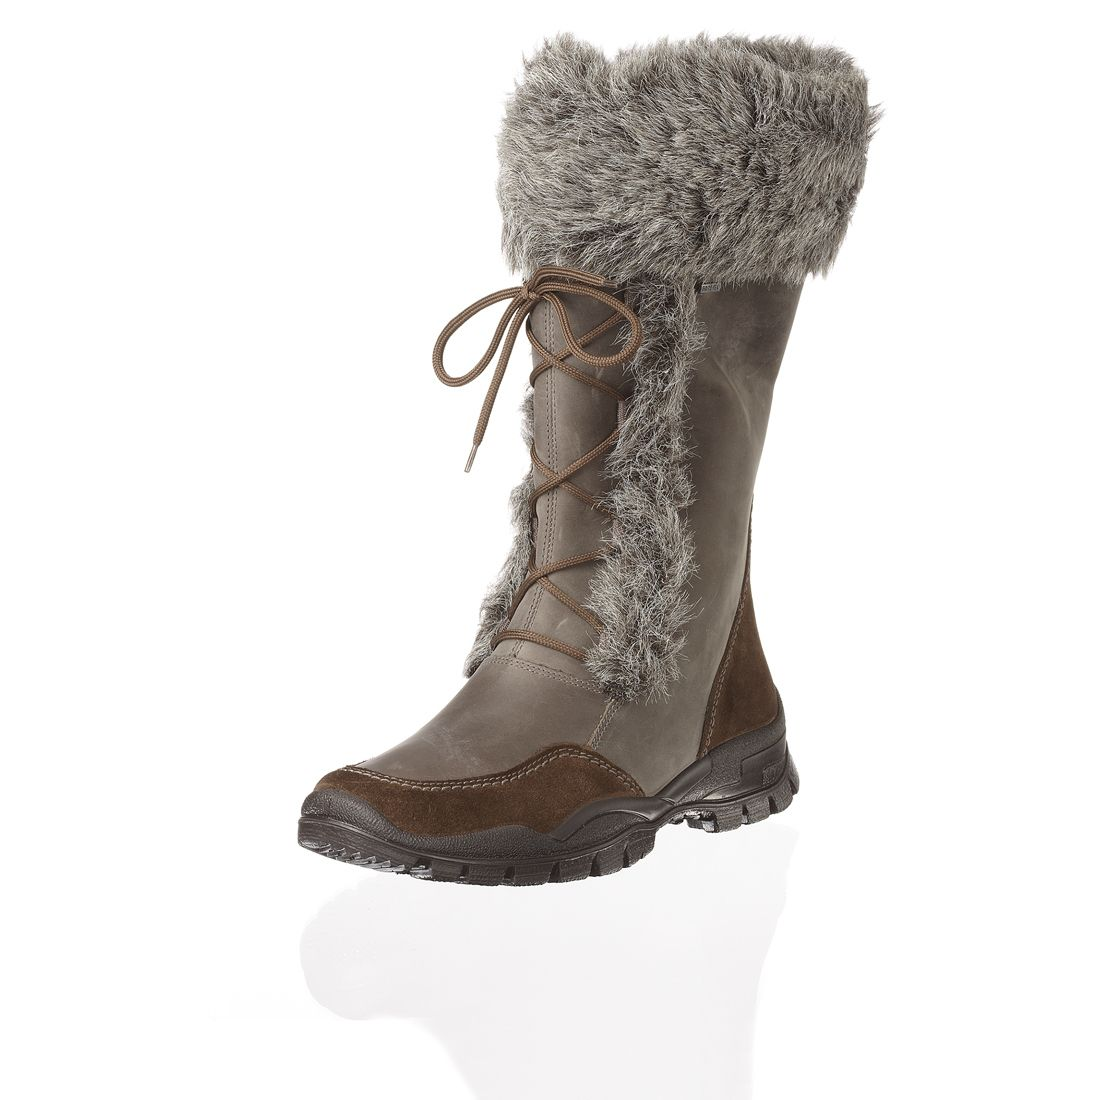 ara women's boots - ara-schuhe-shop.com